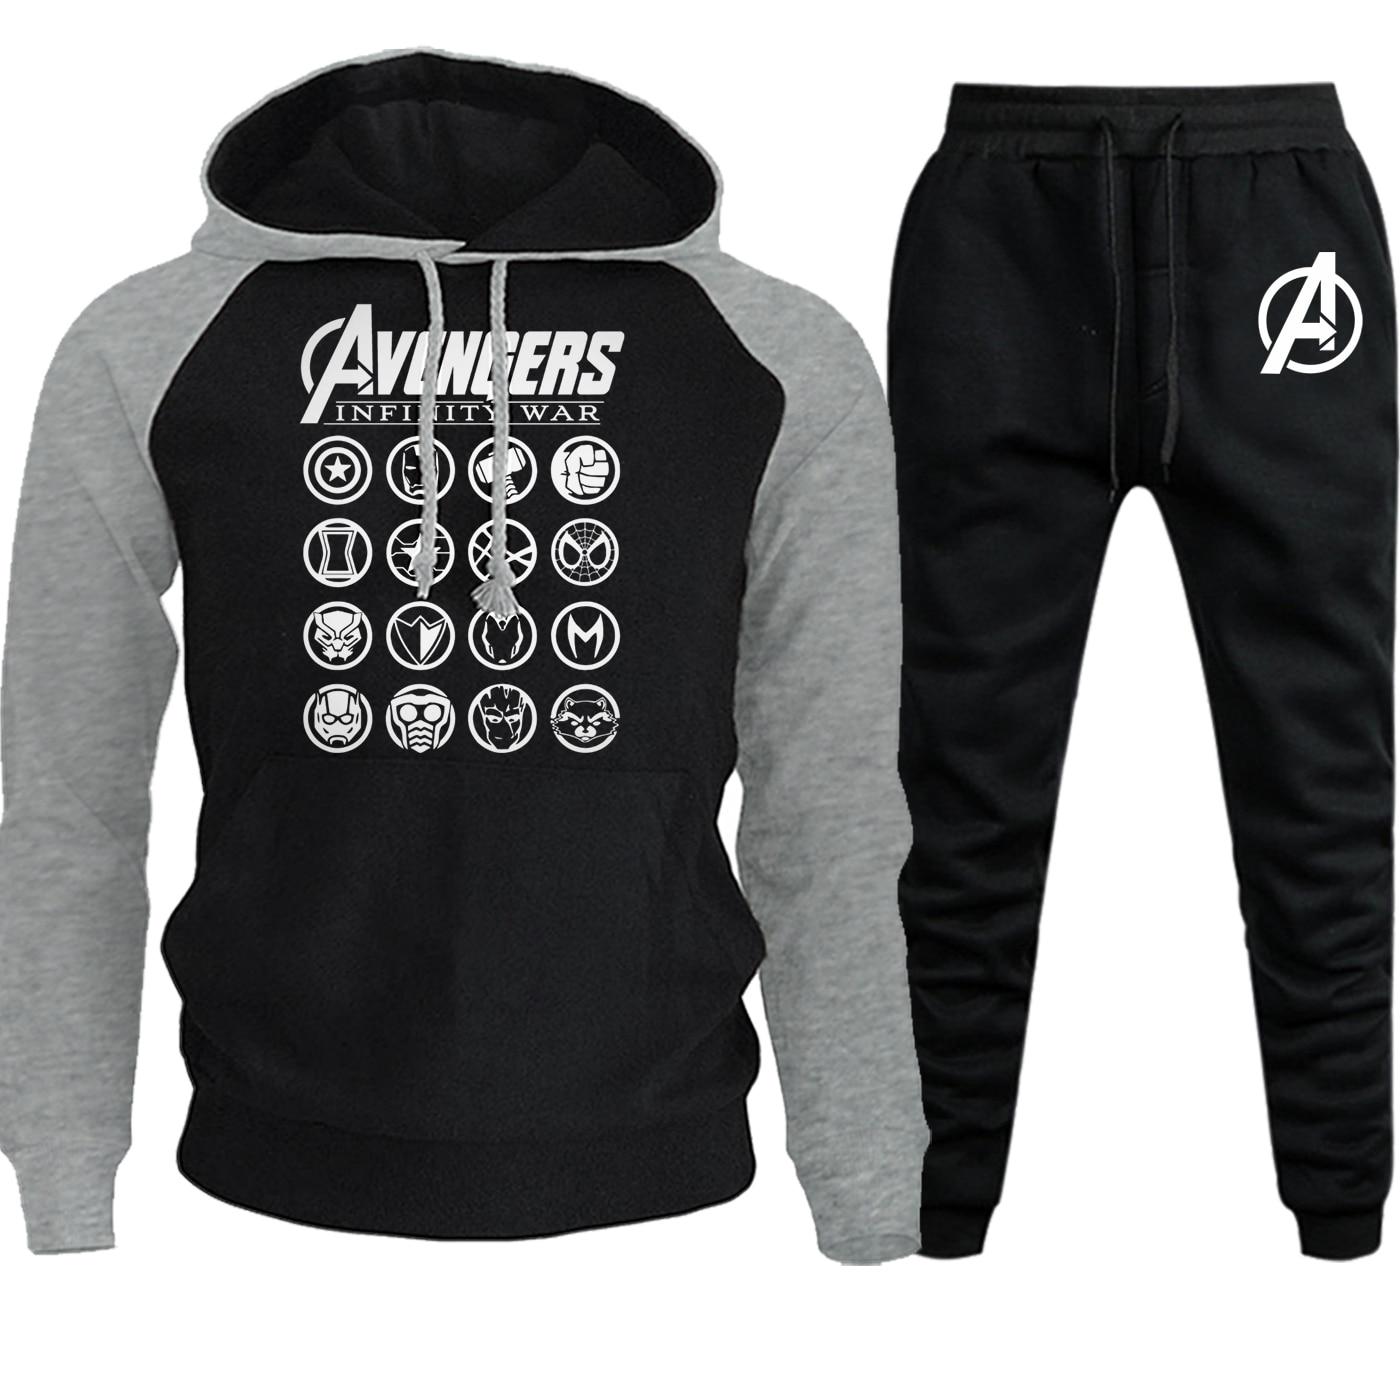 The Avengers Logo Streetwear Raglan Hoodies New Autumn Winter 2019 Casual Pullover Suit Male Fleece Hooded+Pants 2 Piece Set